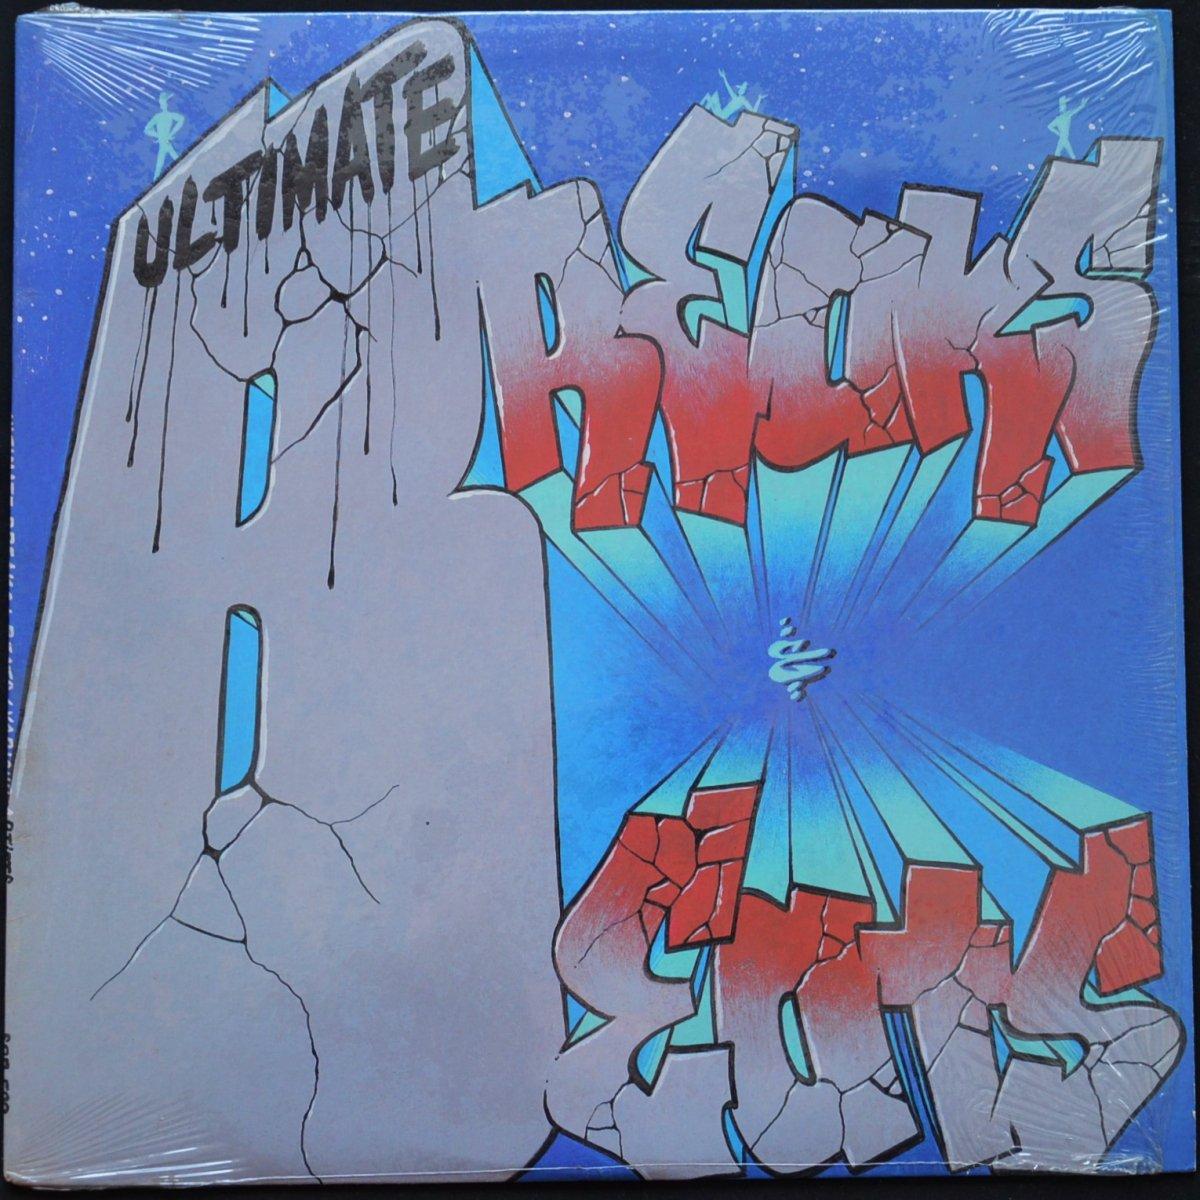 V.A.(BARRABAS,CREATIVE SOURCE,SOUTHSIDE MOVEMENT...) / ULTIMATE BREAKS & BEATS - 522 (LP)